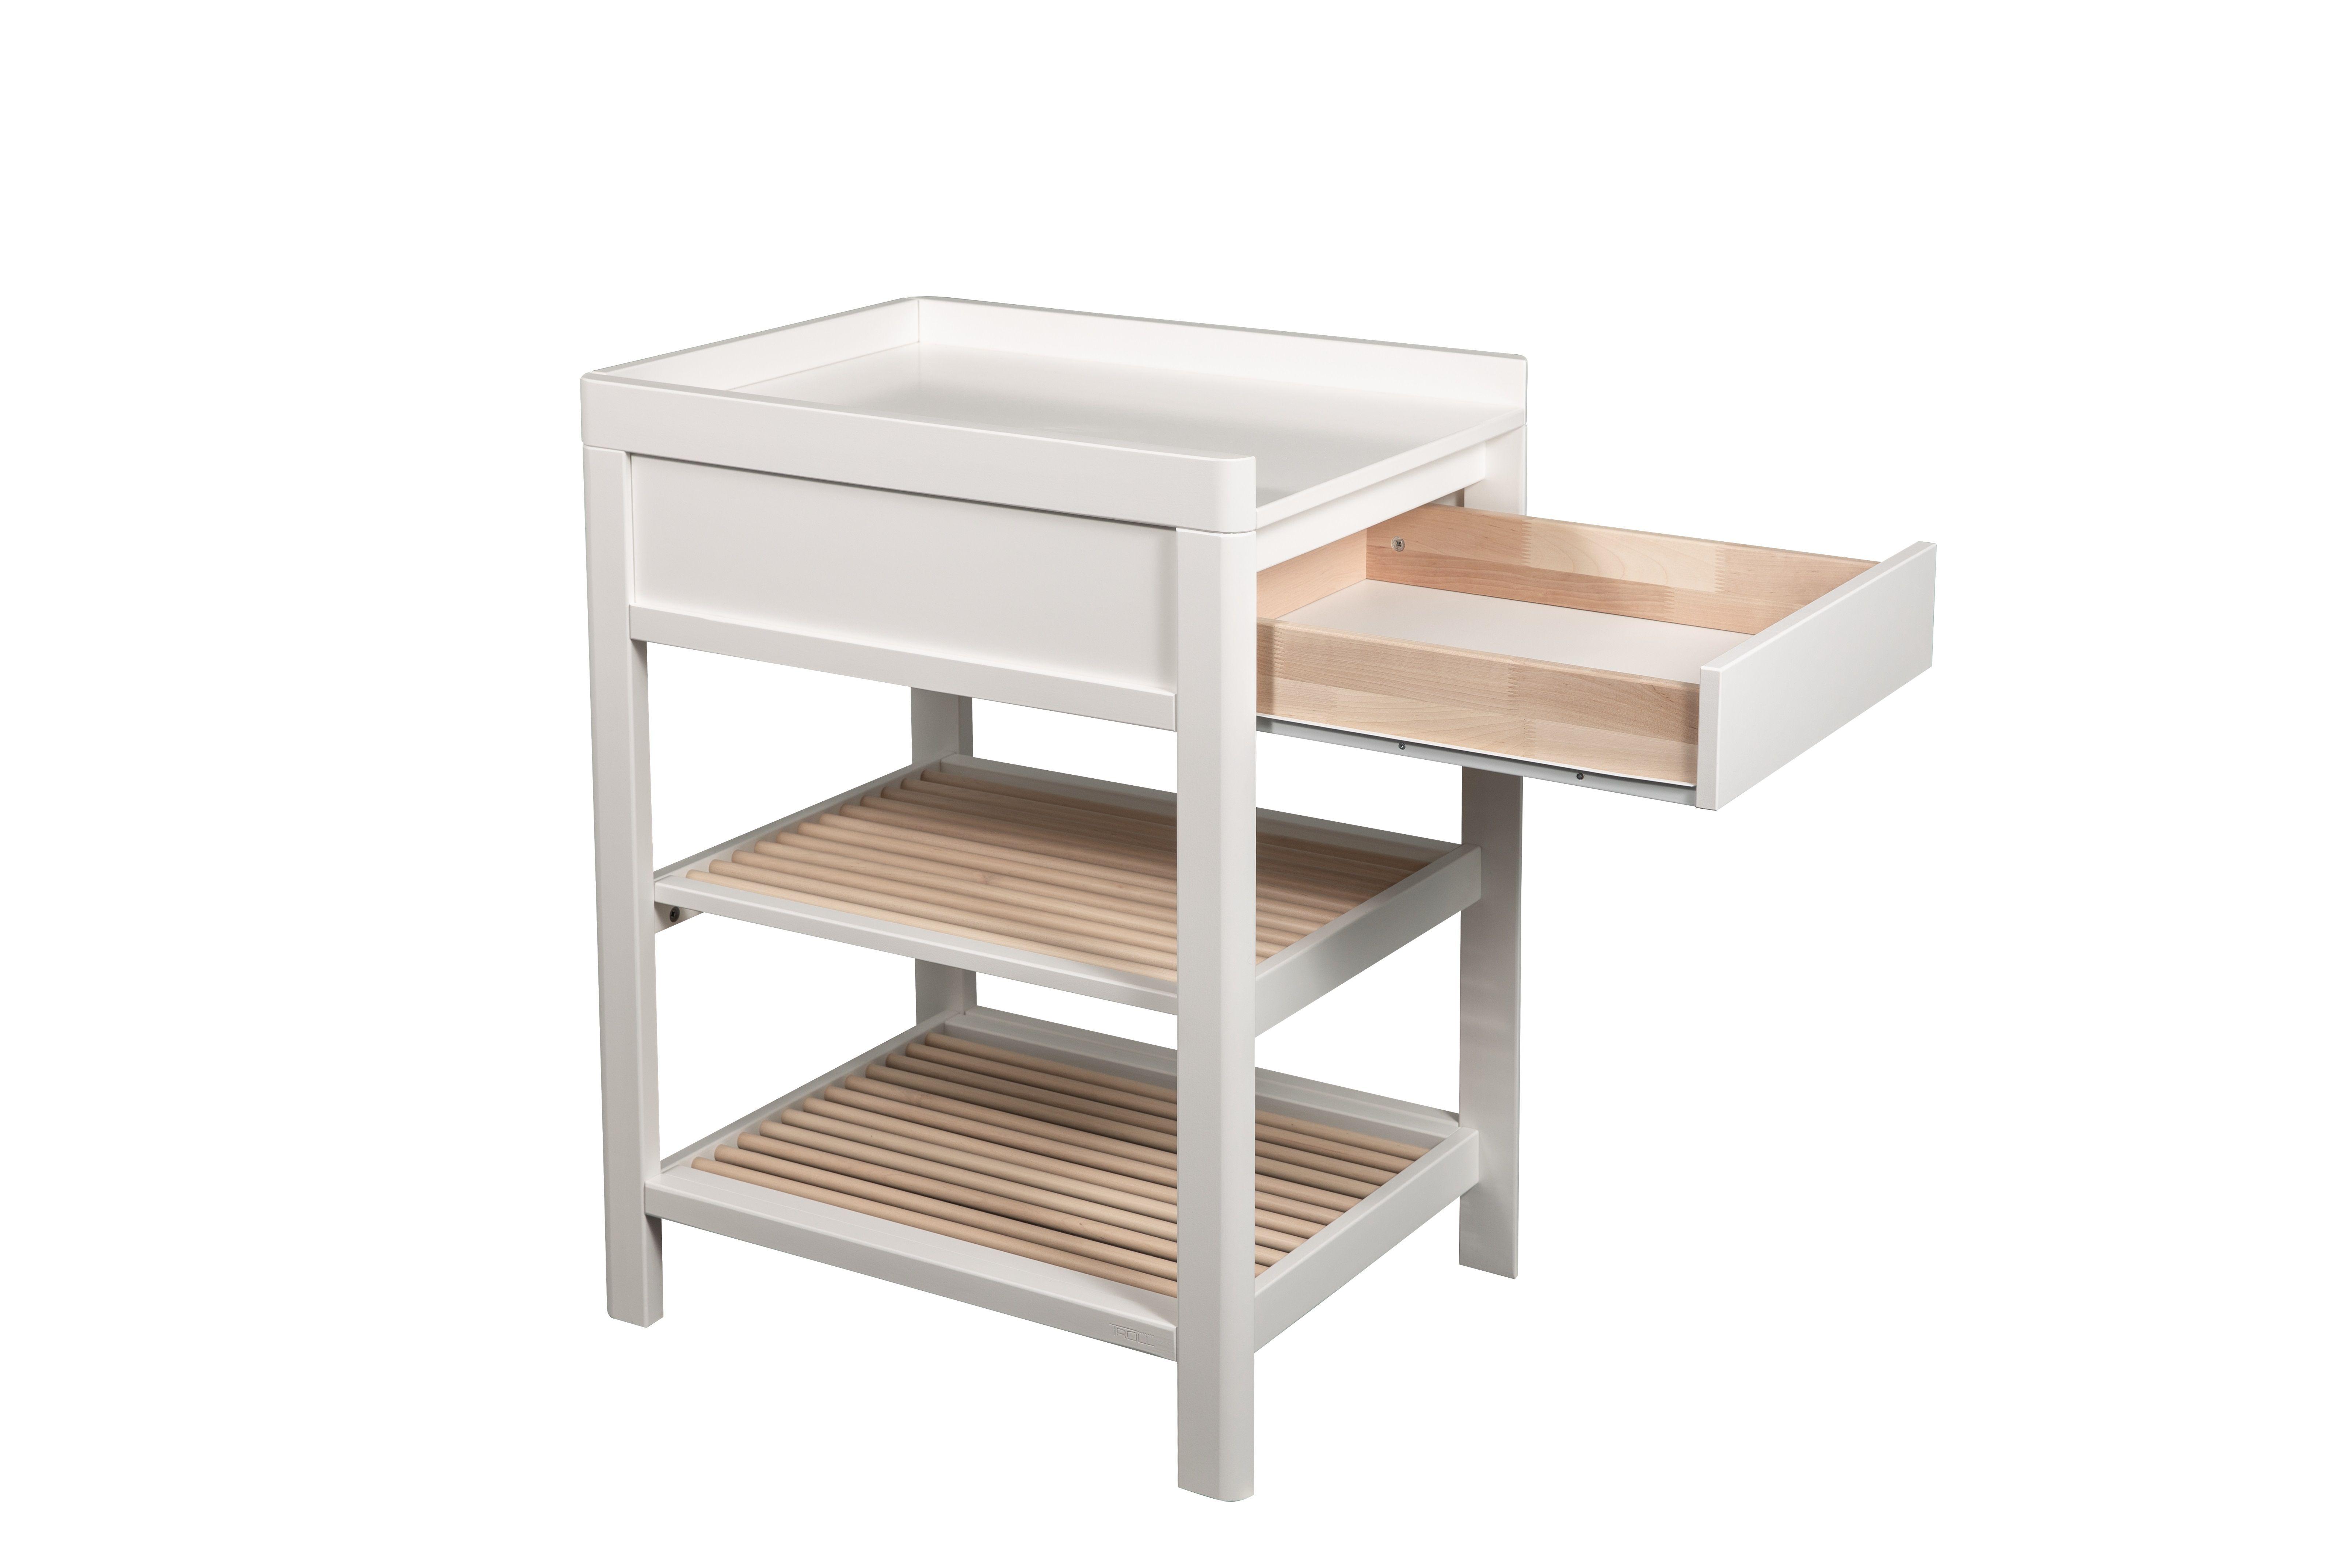 Bērnu pārtinamais galds ar atvilktni TROLL Lukas White natural CTL-LU0523SFG-NA